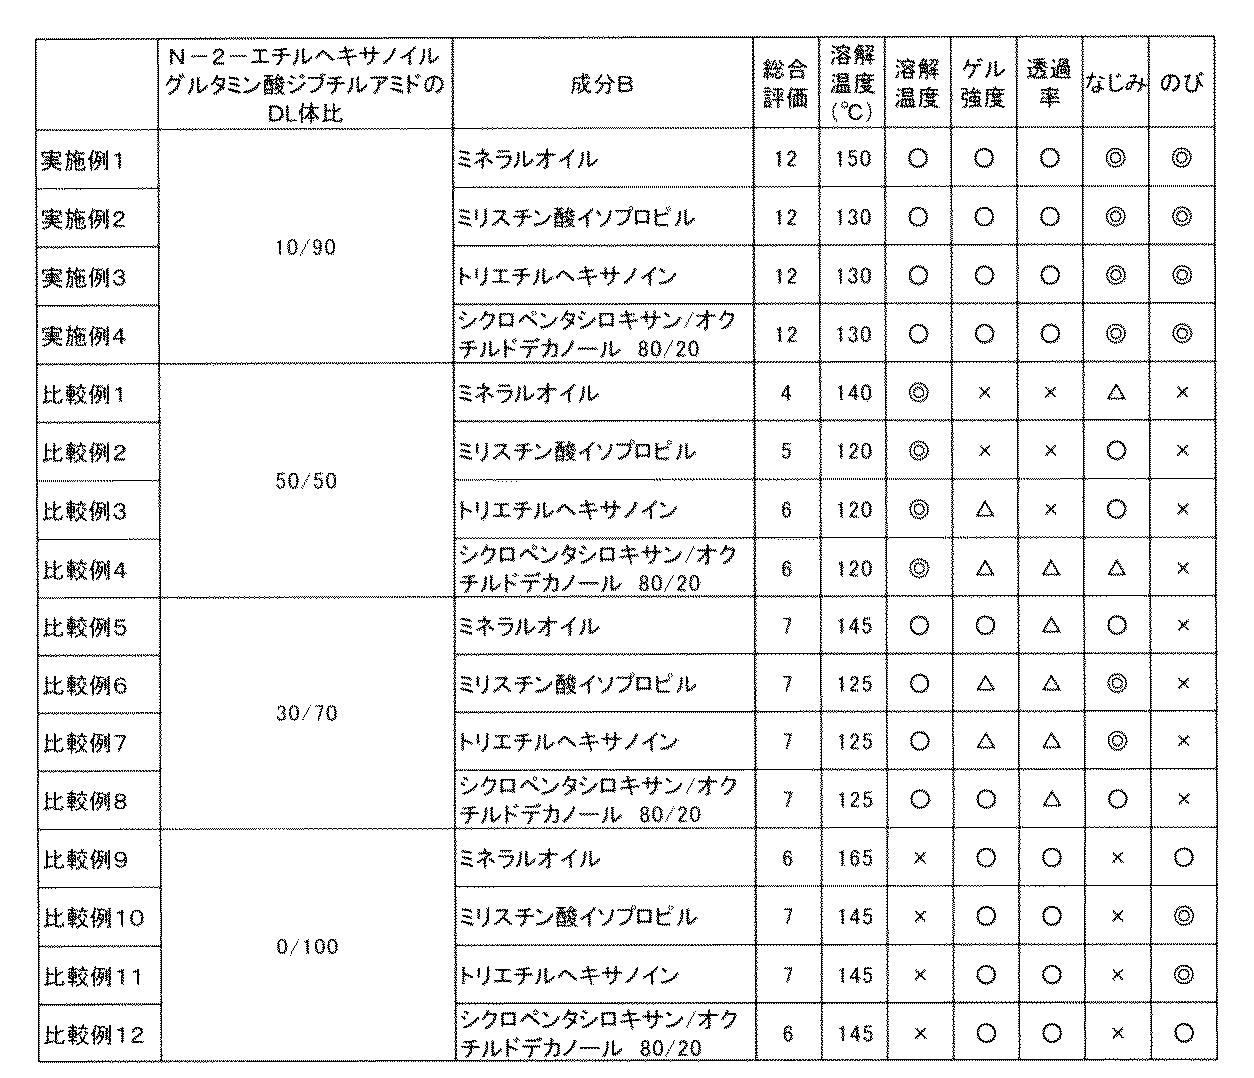 危険物第4類 引火性液体 - chemical-substance.com